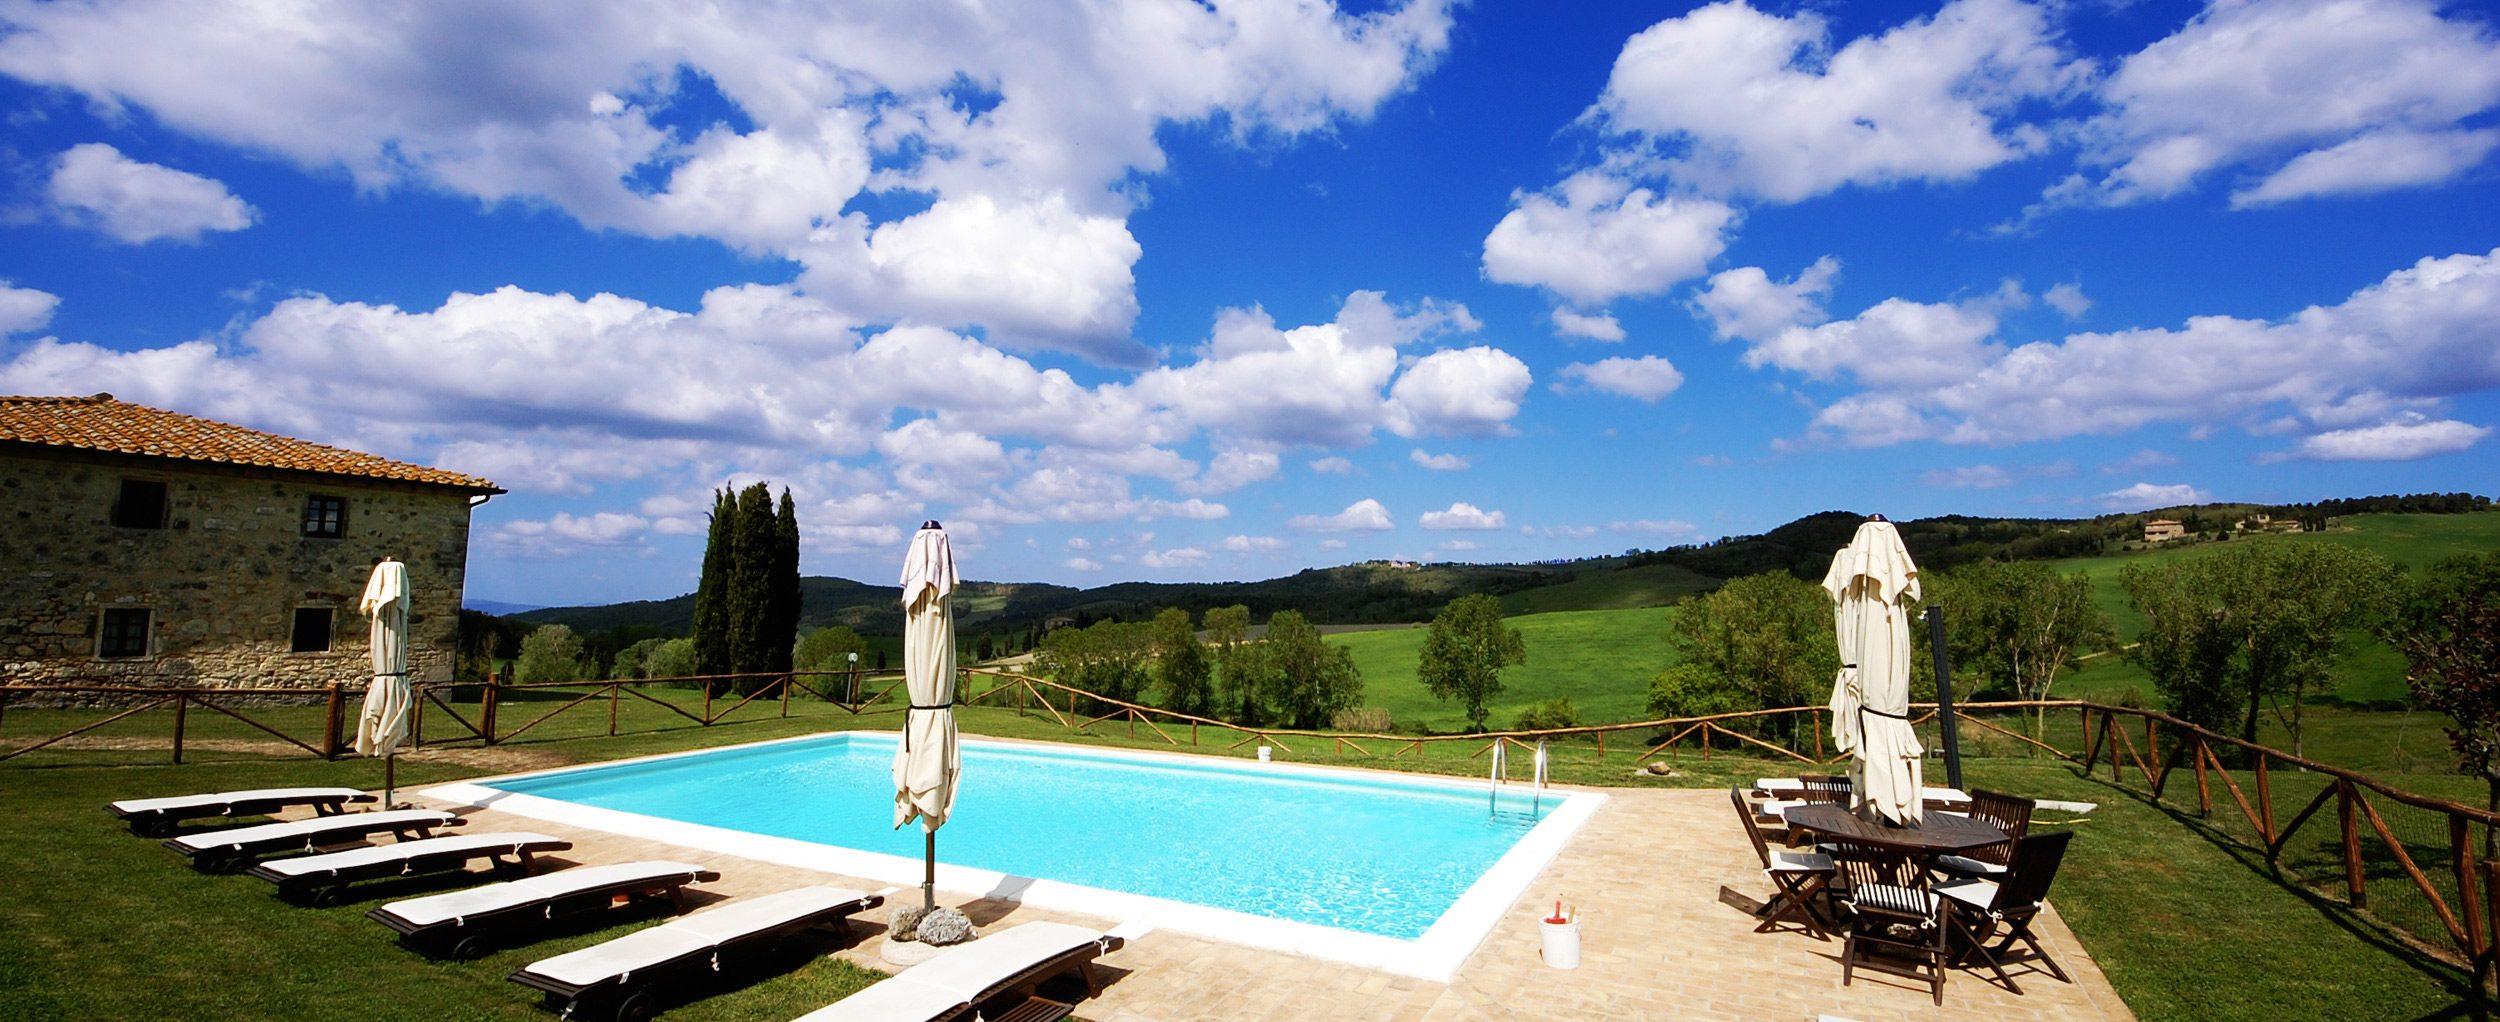 villa in toscana con piscina affitto